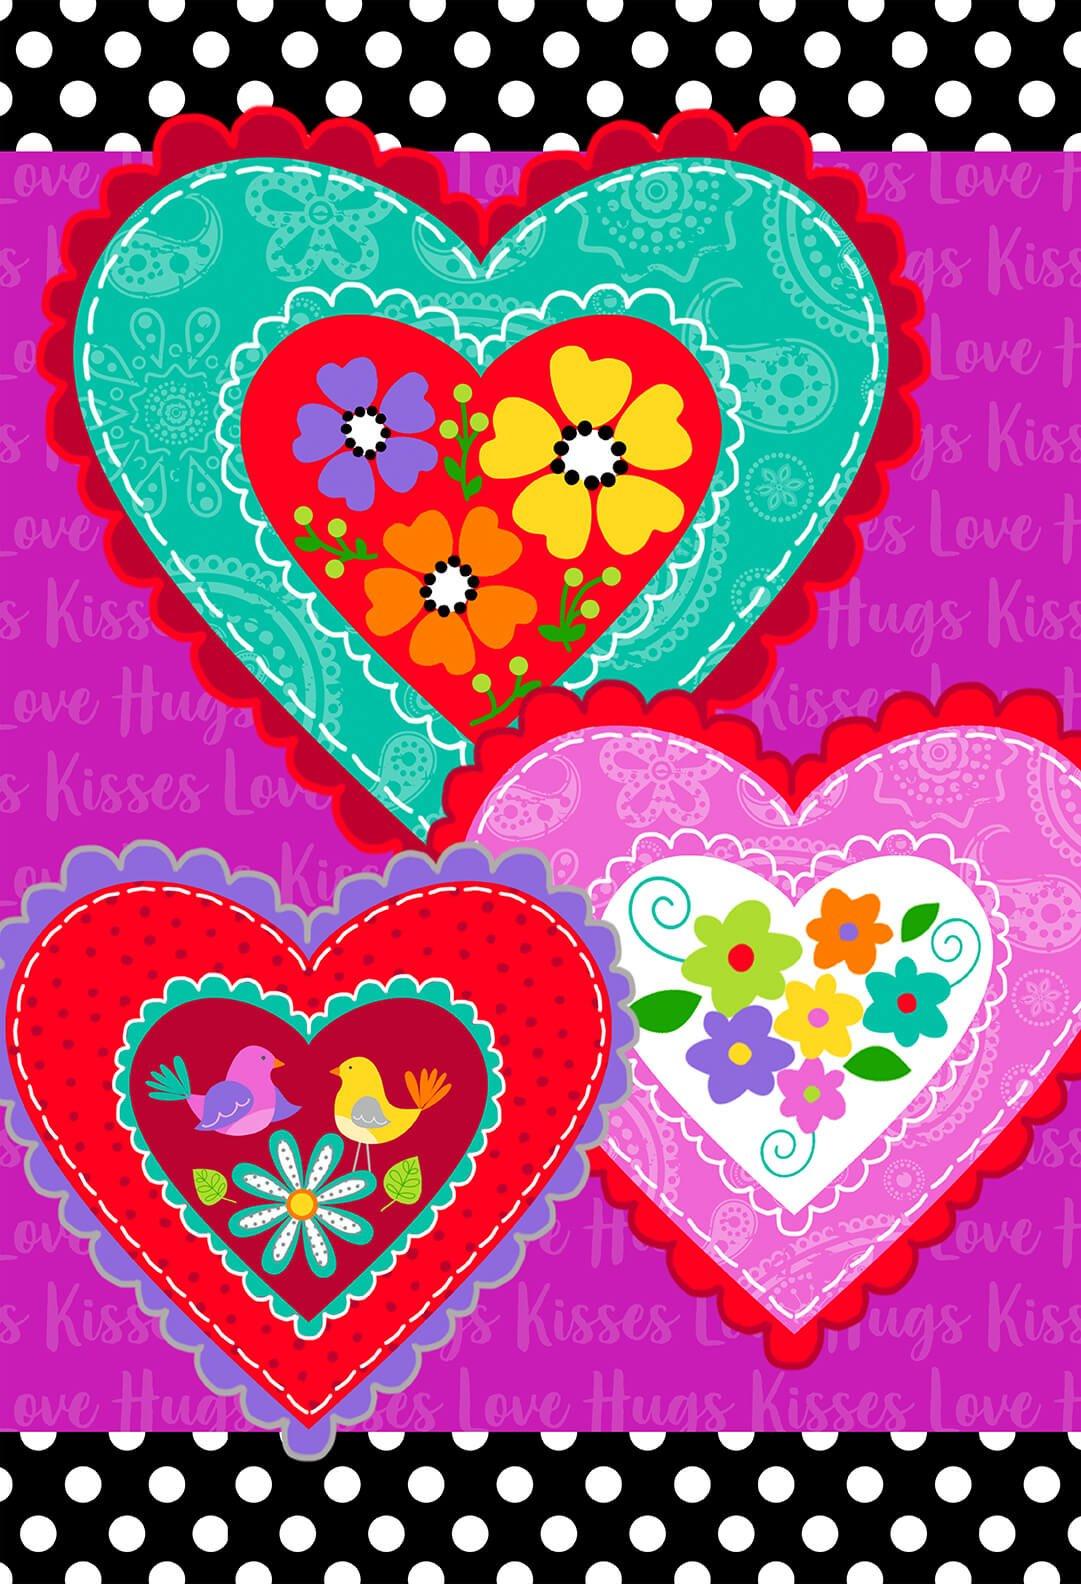 Heart Panel